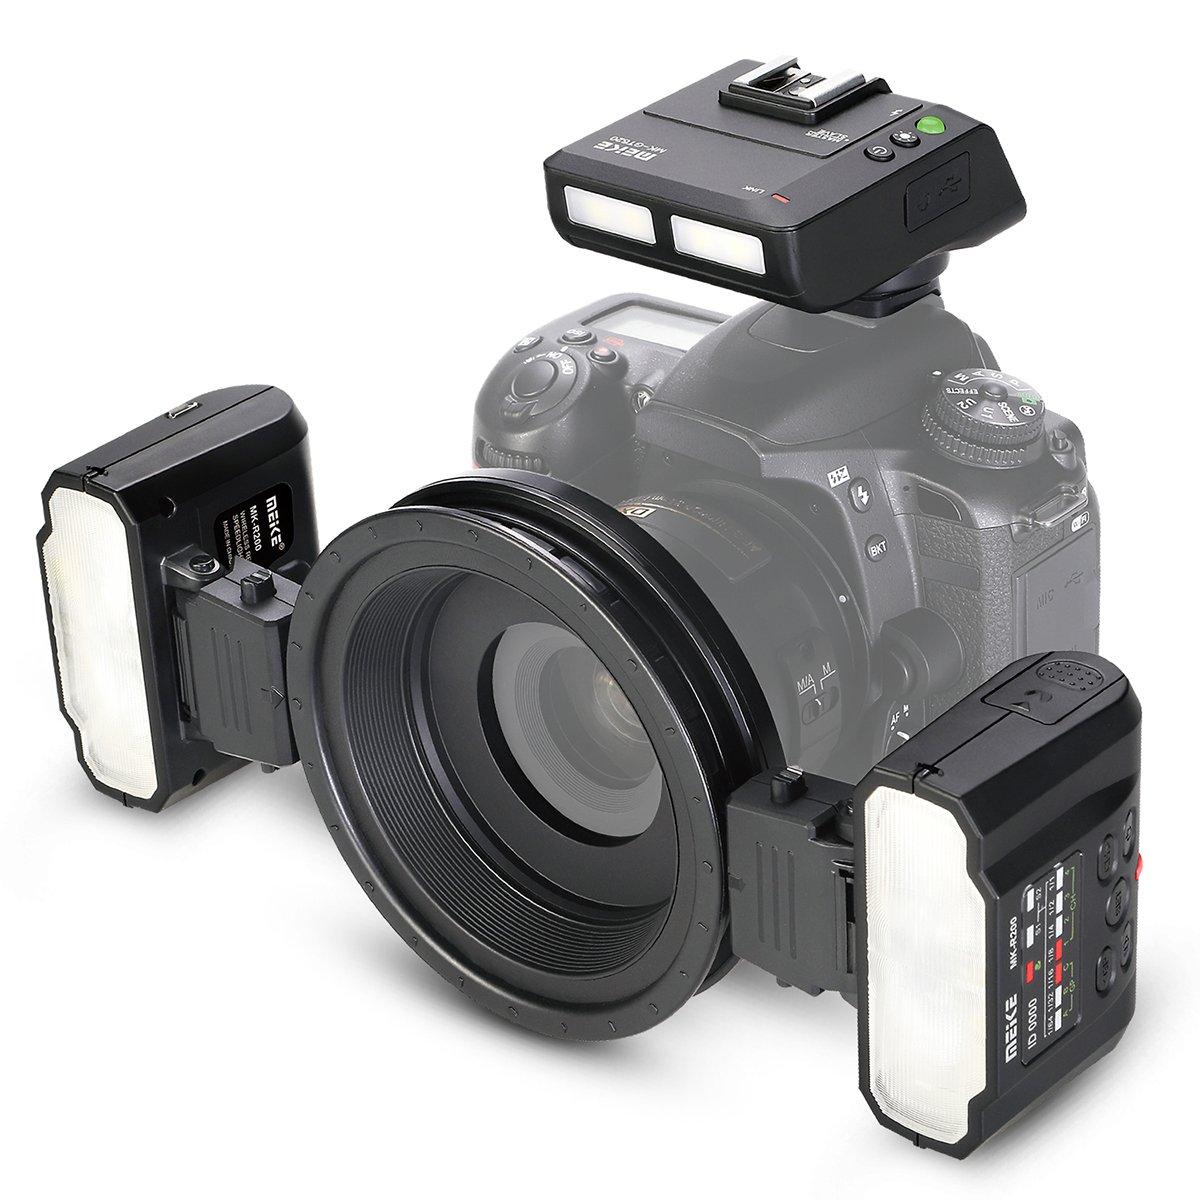 Meike MK-MT24 2.4G Wireless Close-Up Speedlight Macro Twin Lite Flash for Nikon F-Mount Z-Mount Digital SLR Cameras D1X D2 D2H D2X D3 D3X D200 D300 D300S D700 Z6 Z7, etc